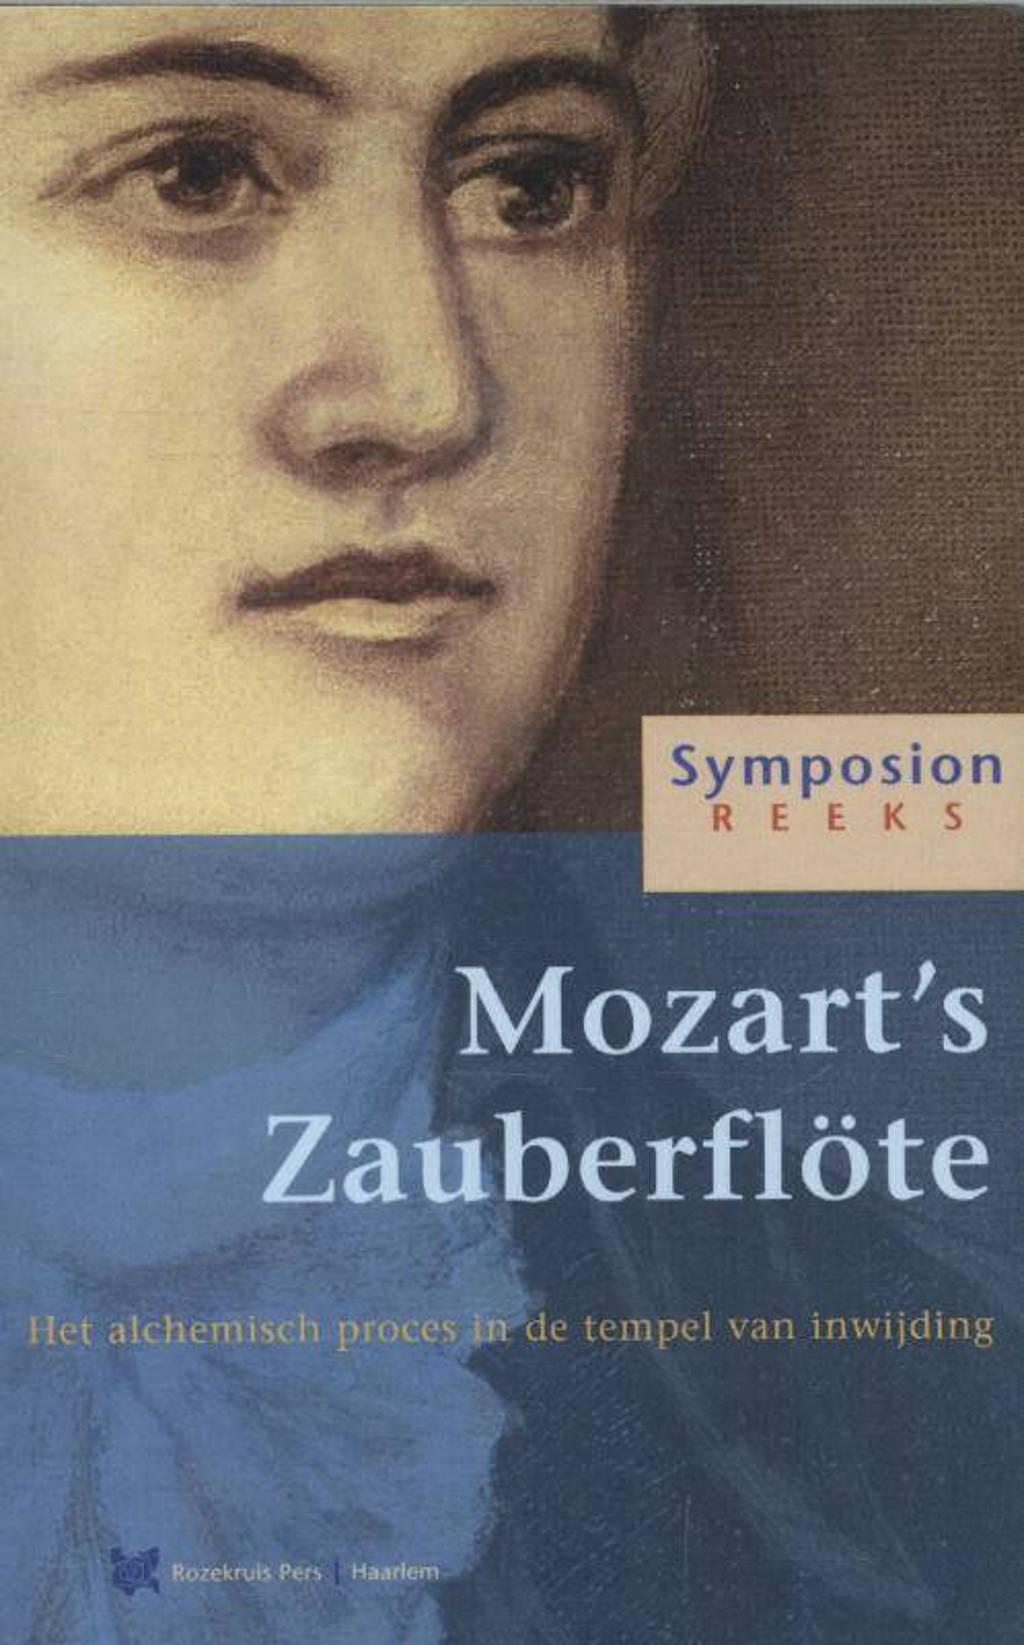 Symposionreeks: Mozarts Zauberflote